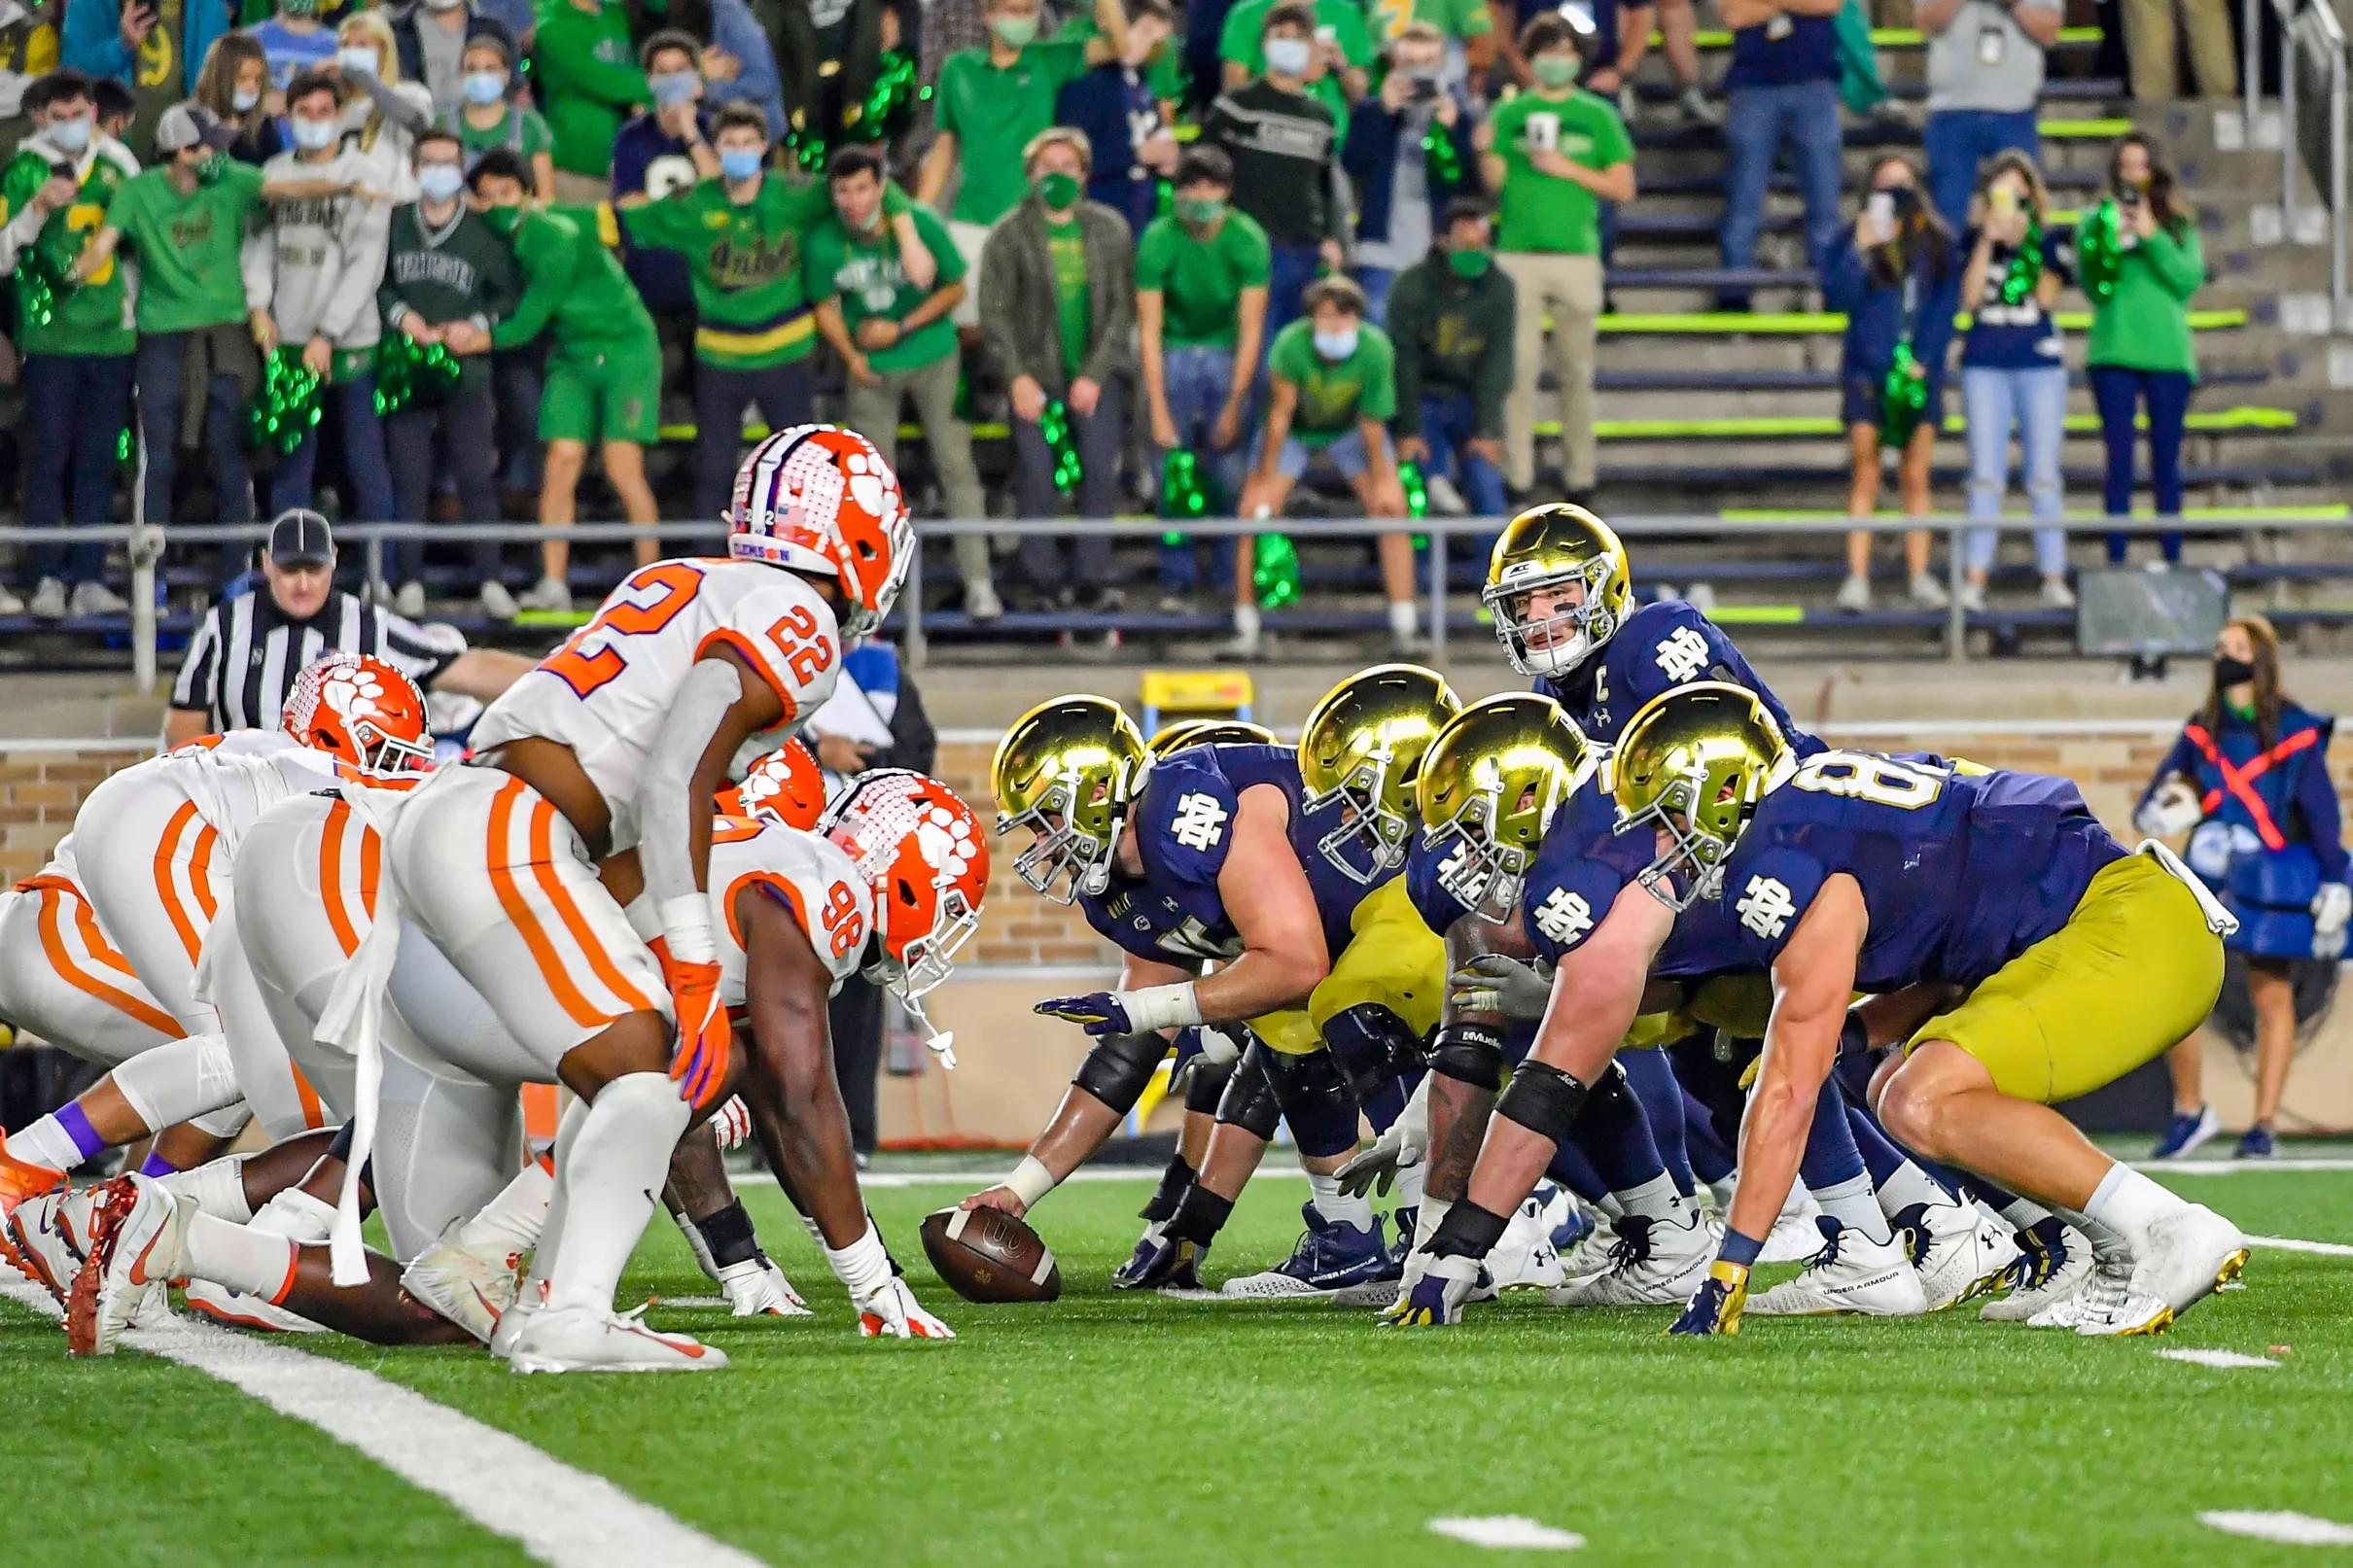 espn college football games thursday night football tomorrow